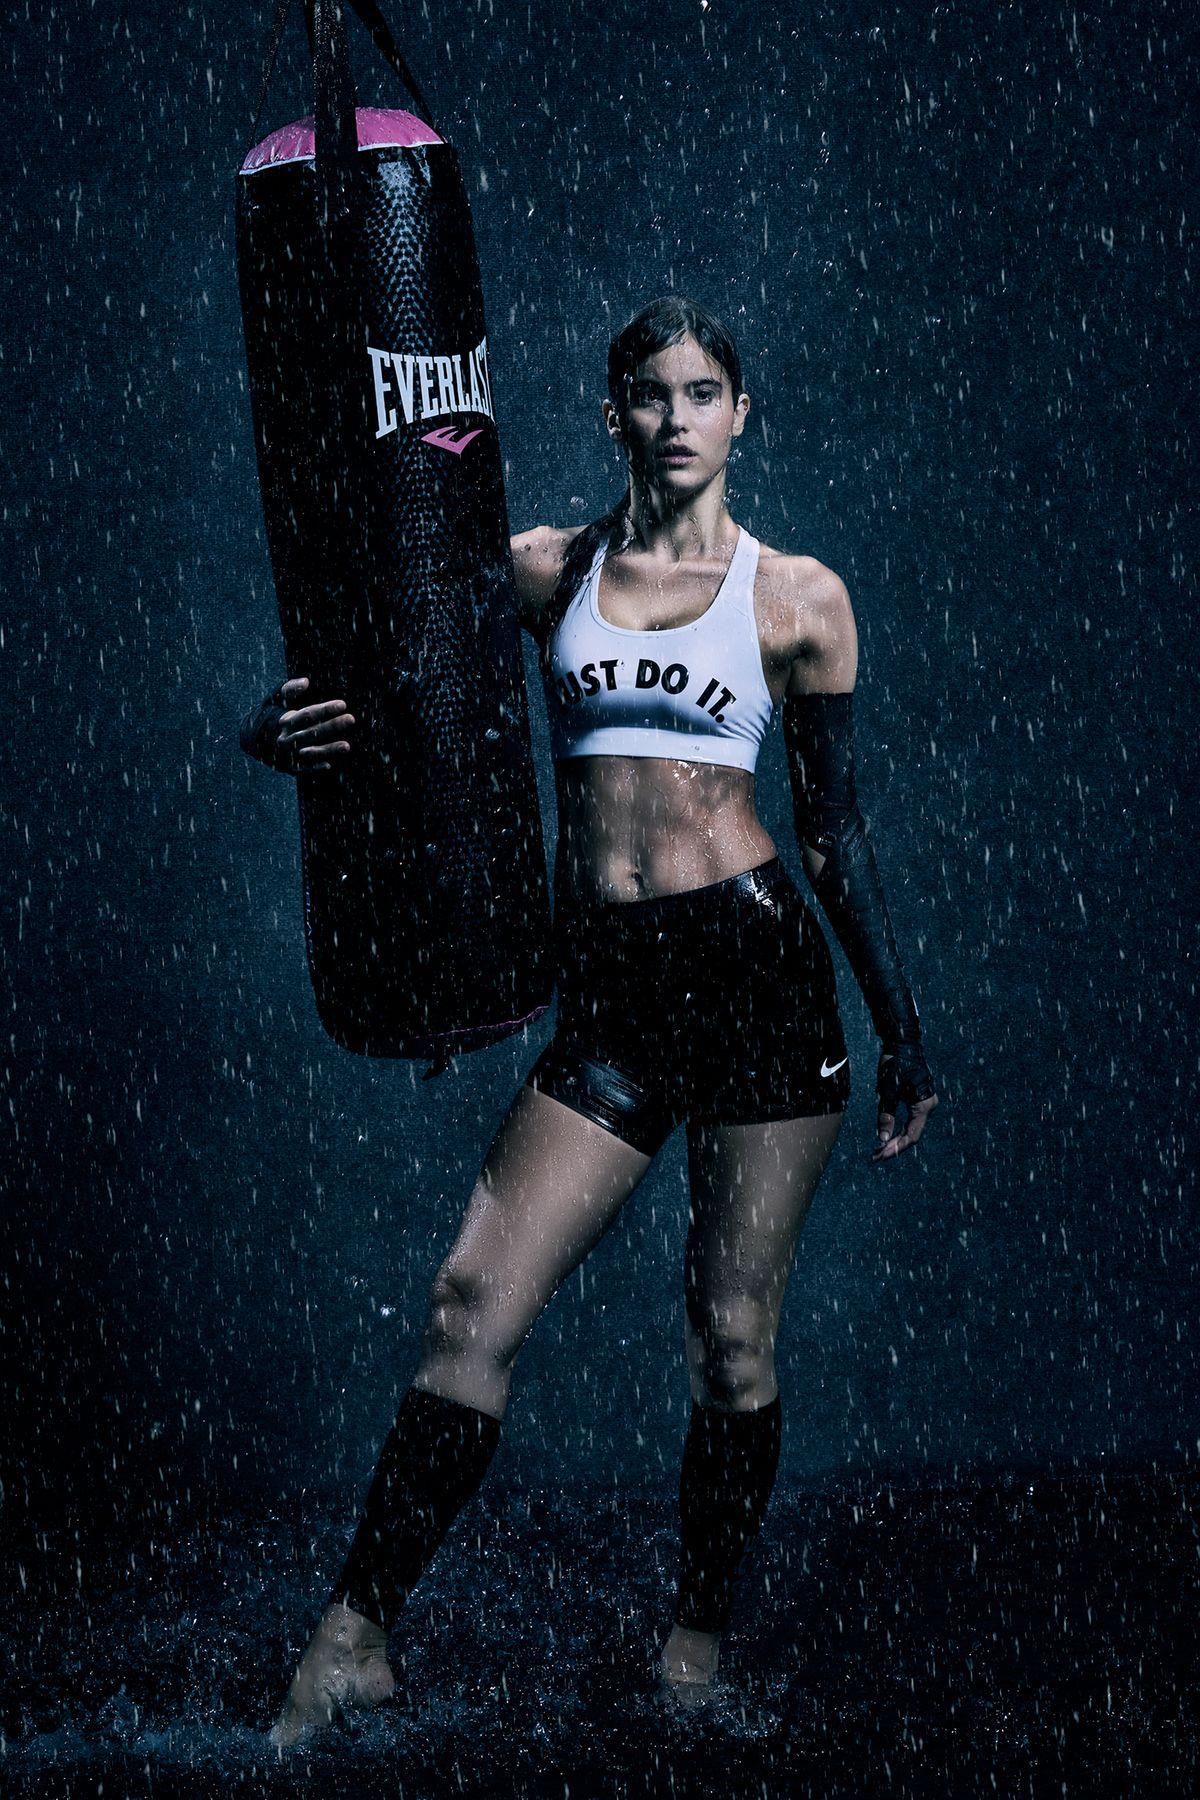 Breanna_Fitness Rain_SHOT 7_013.jpg